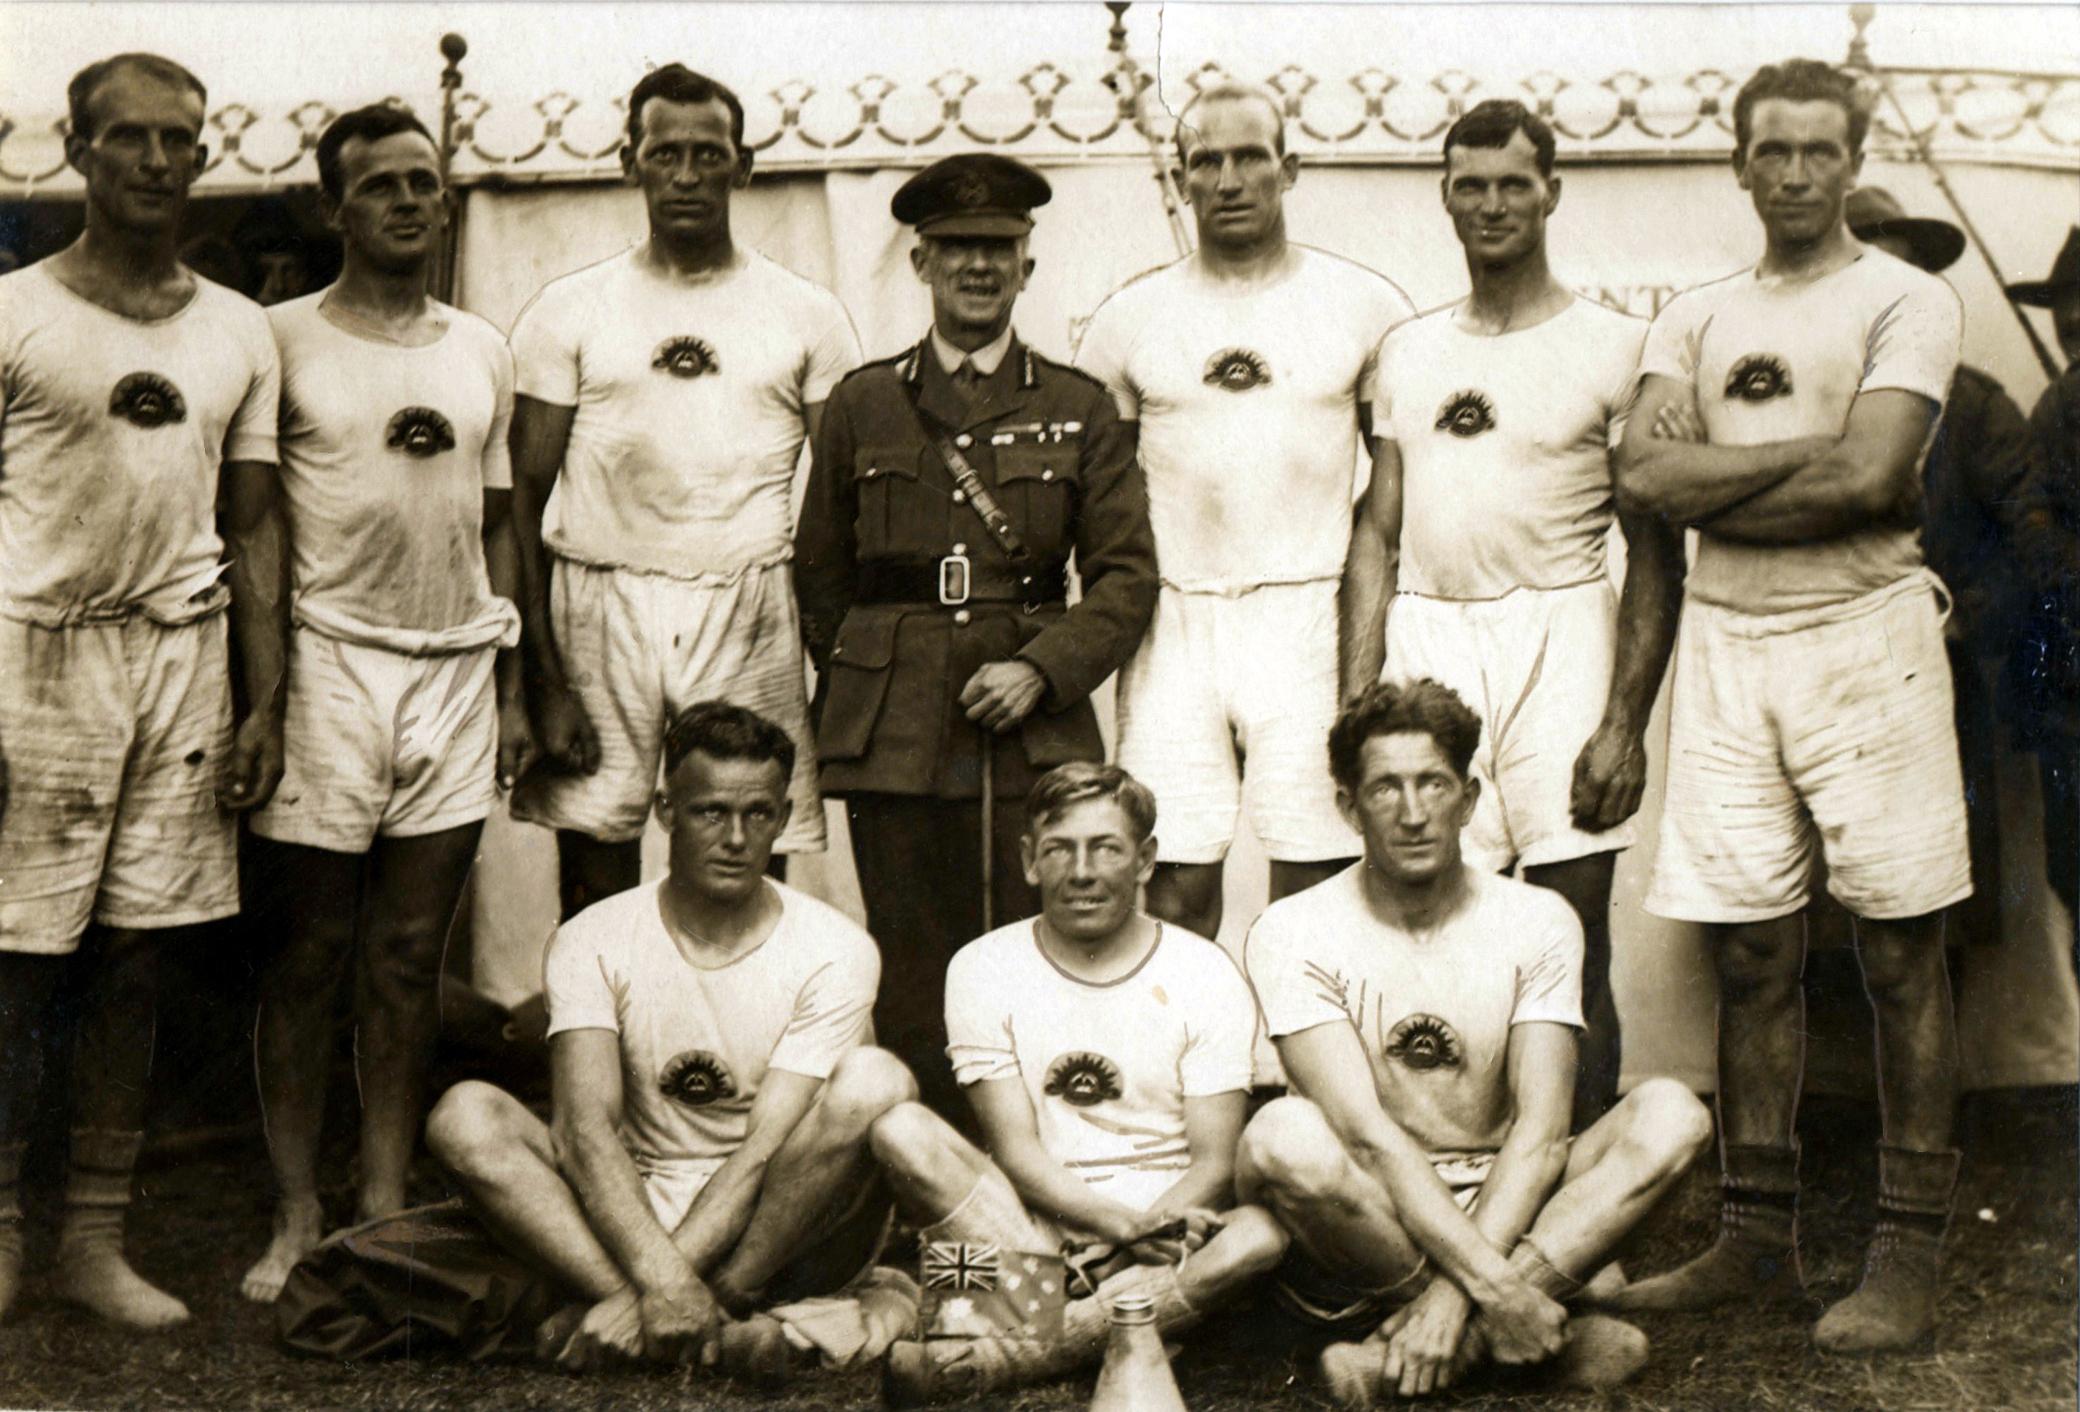 The-AIF-N0.1-Crew.-Winners-of-the-1919-Royal-Henley-Peace-Regatta-v2.jpg